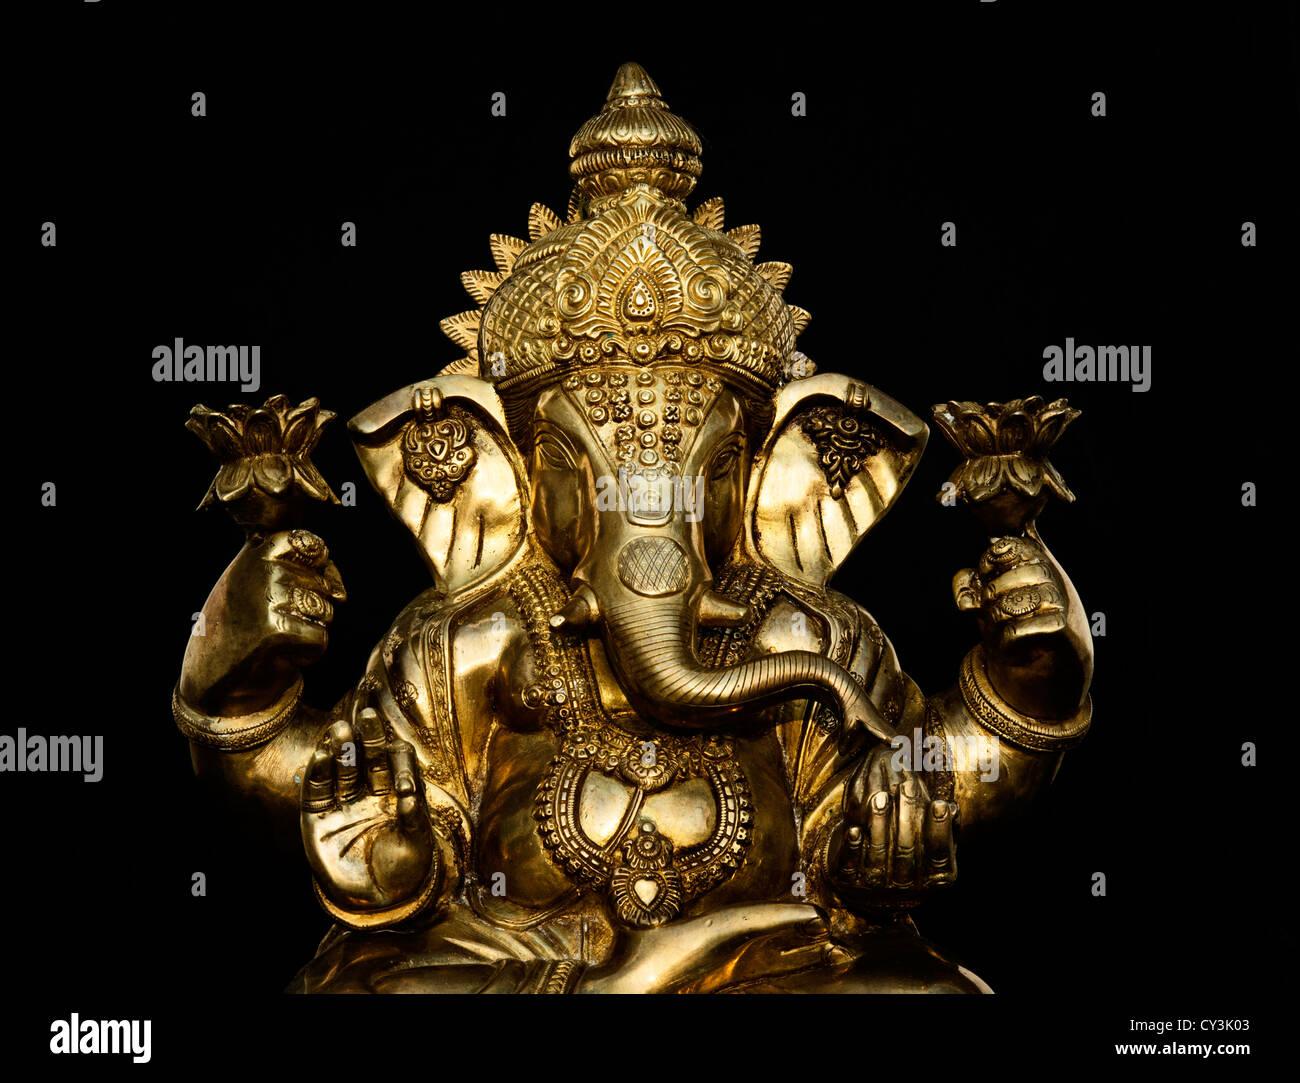 Lord Buddha 3d Live Wallpaper Hindu Elephant God Lord Ganesha Statue Against Black